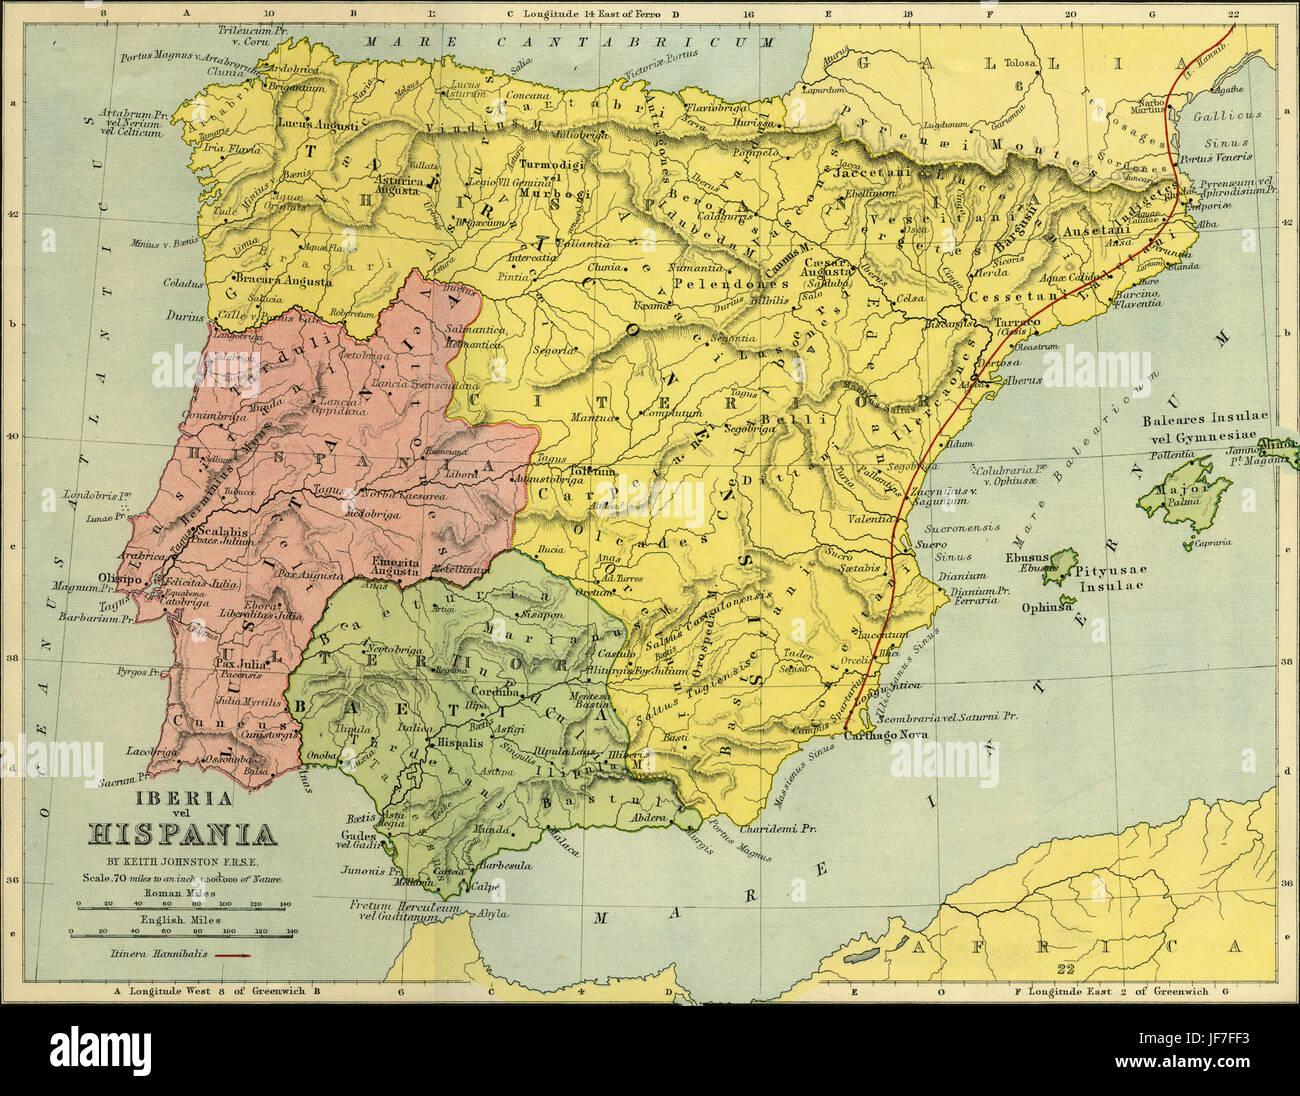 Map of Iberia vel Hispania - the Iberian peninsula as it was in ...